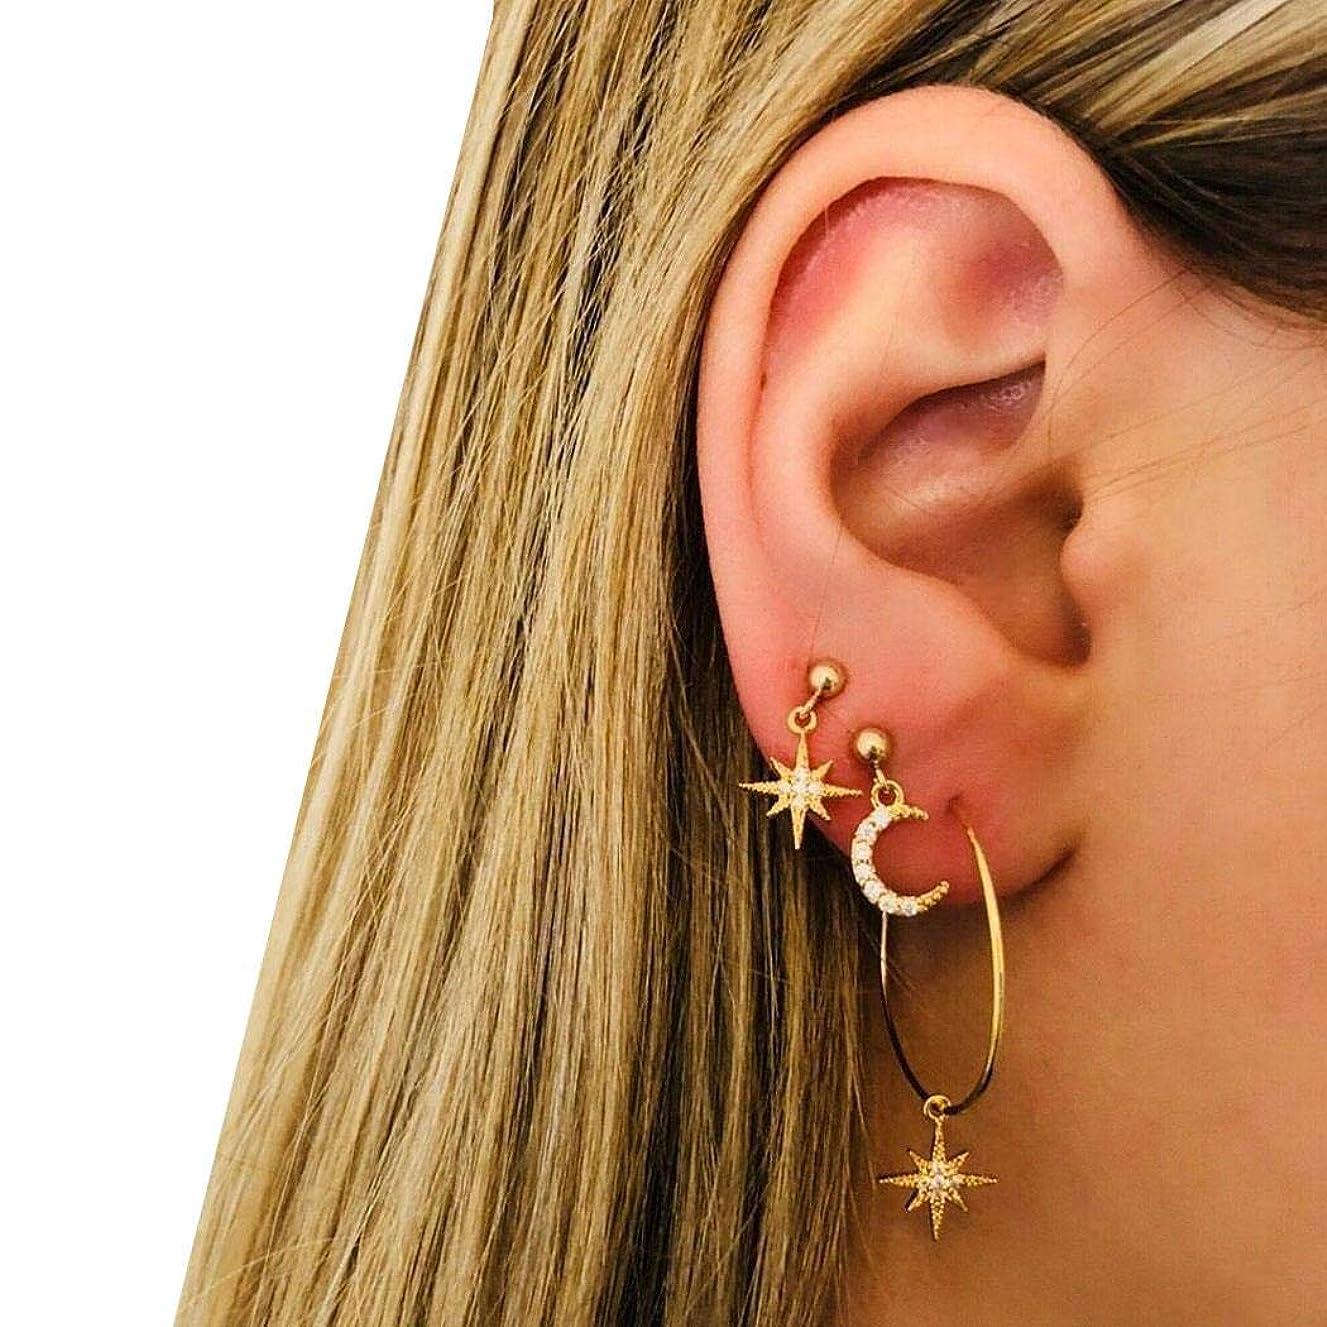 XioNiu Women Fashion Rhinestone Moon Star Stud Earrings Ear Hoop Set Drop & Dangle